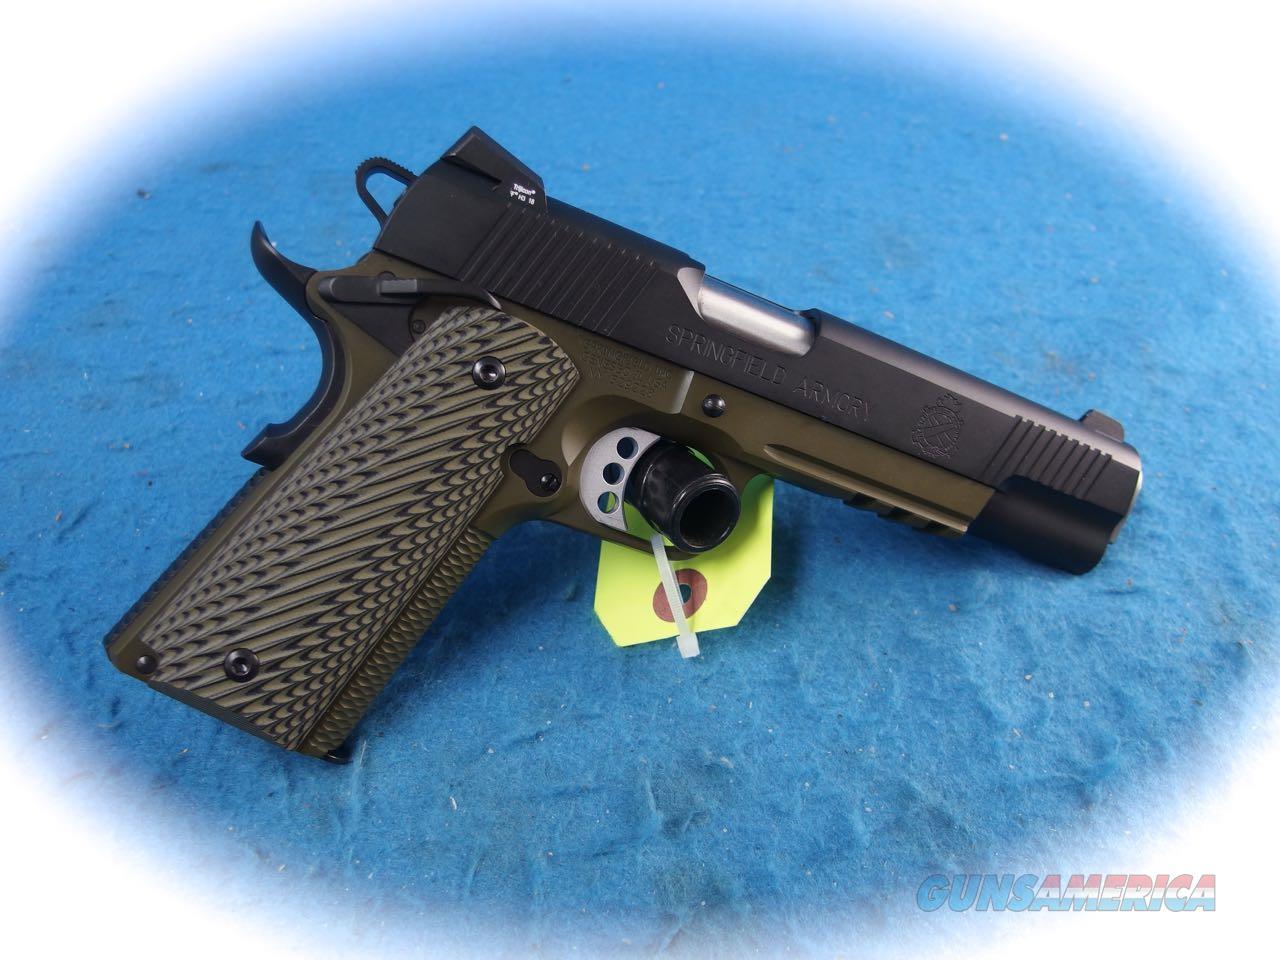 Springfield Armory 1911 Loaded MC Operator .45 ACP Pistol PX9110ML18 **New**  Guns > Pistols > Springfield Armory Pistols > 1911 Type